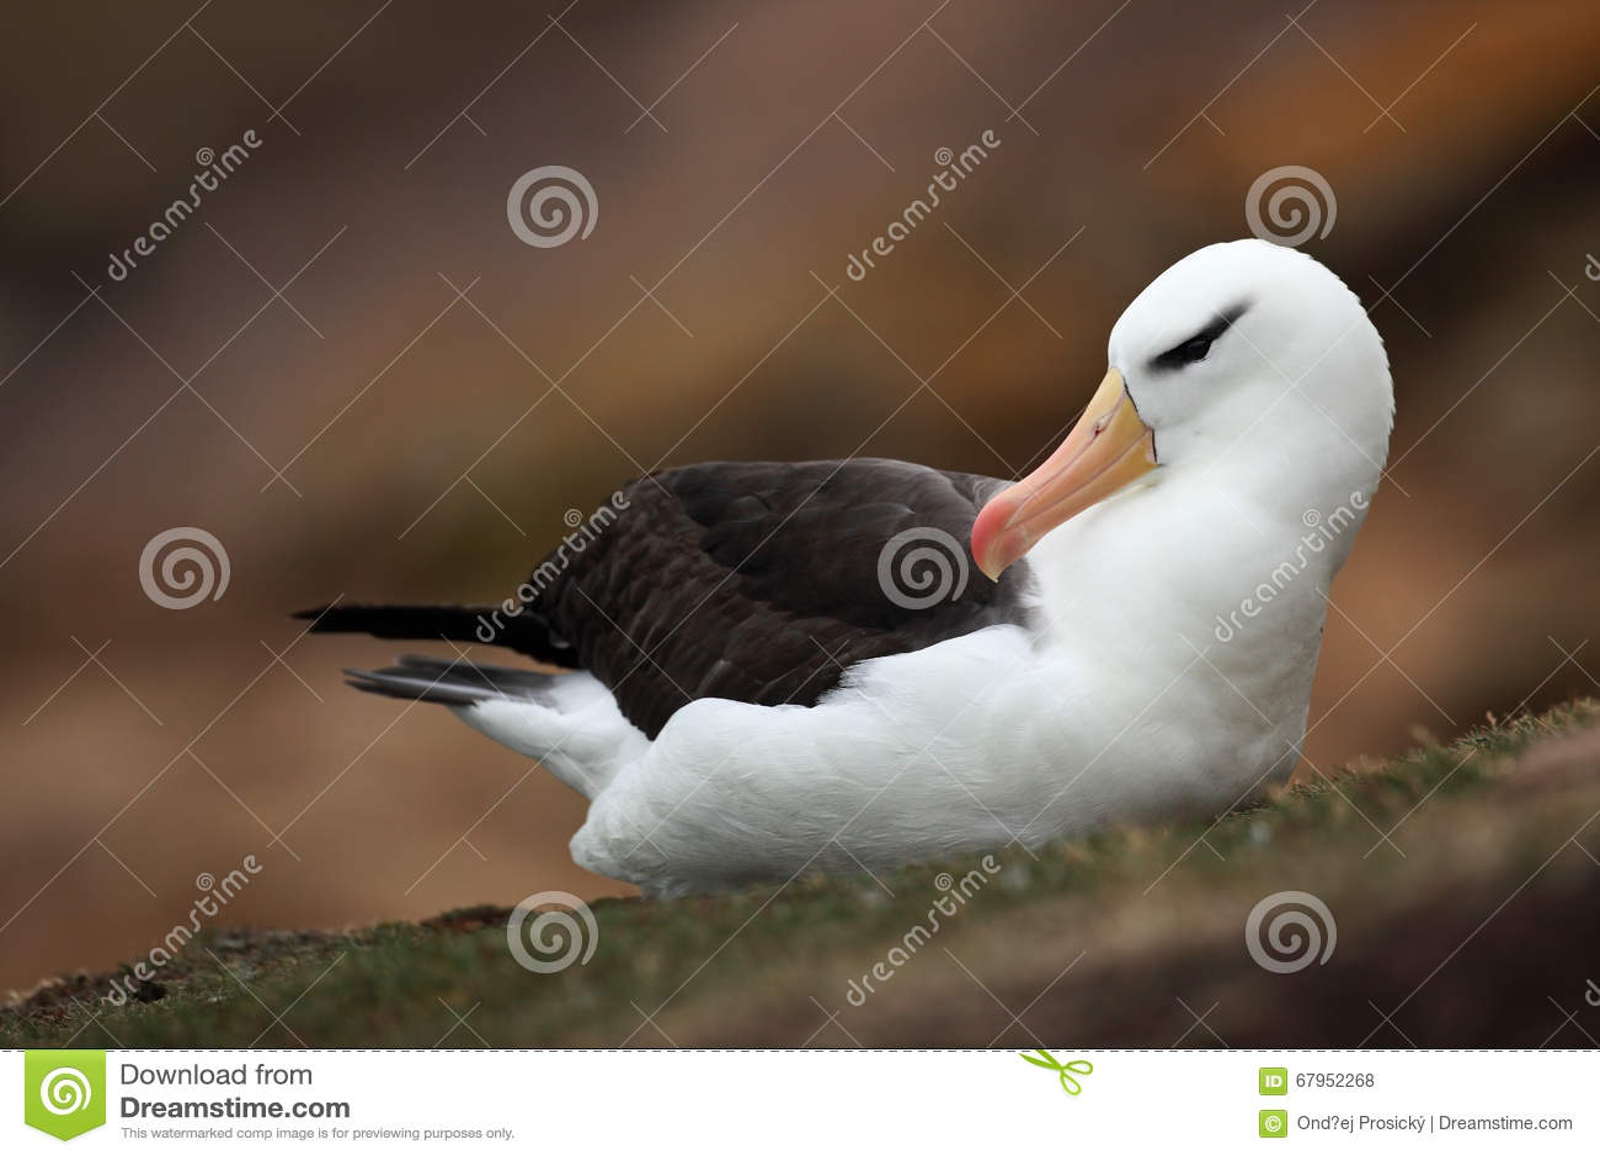 Black-browed albatross, Thalassarche melanophris, on the Falkland Islands